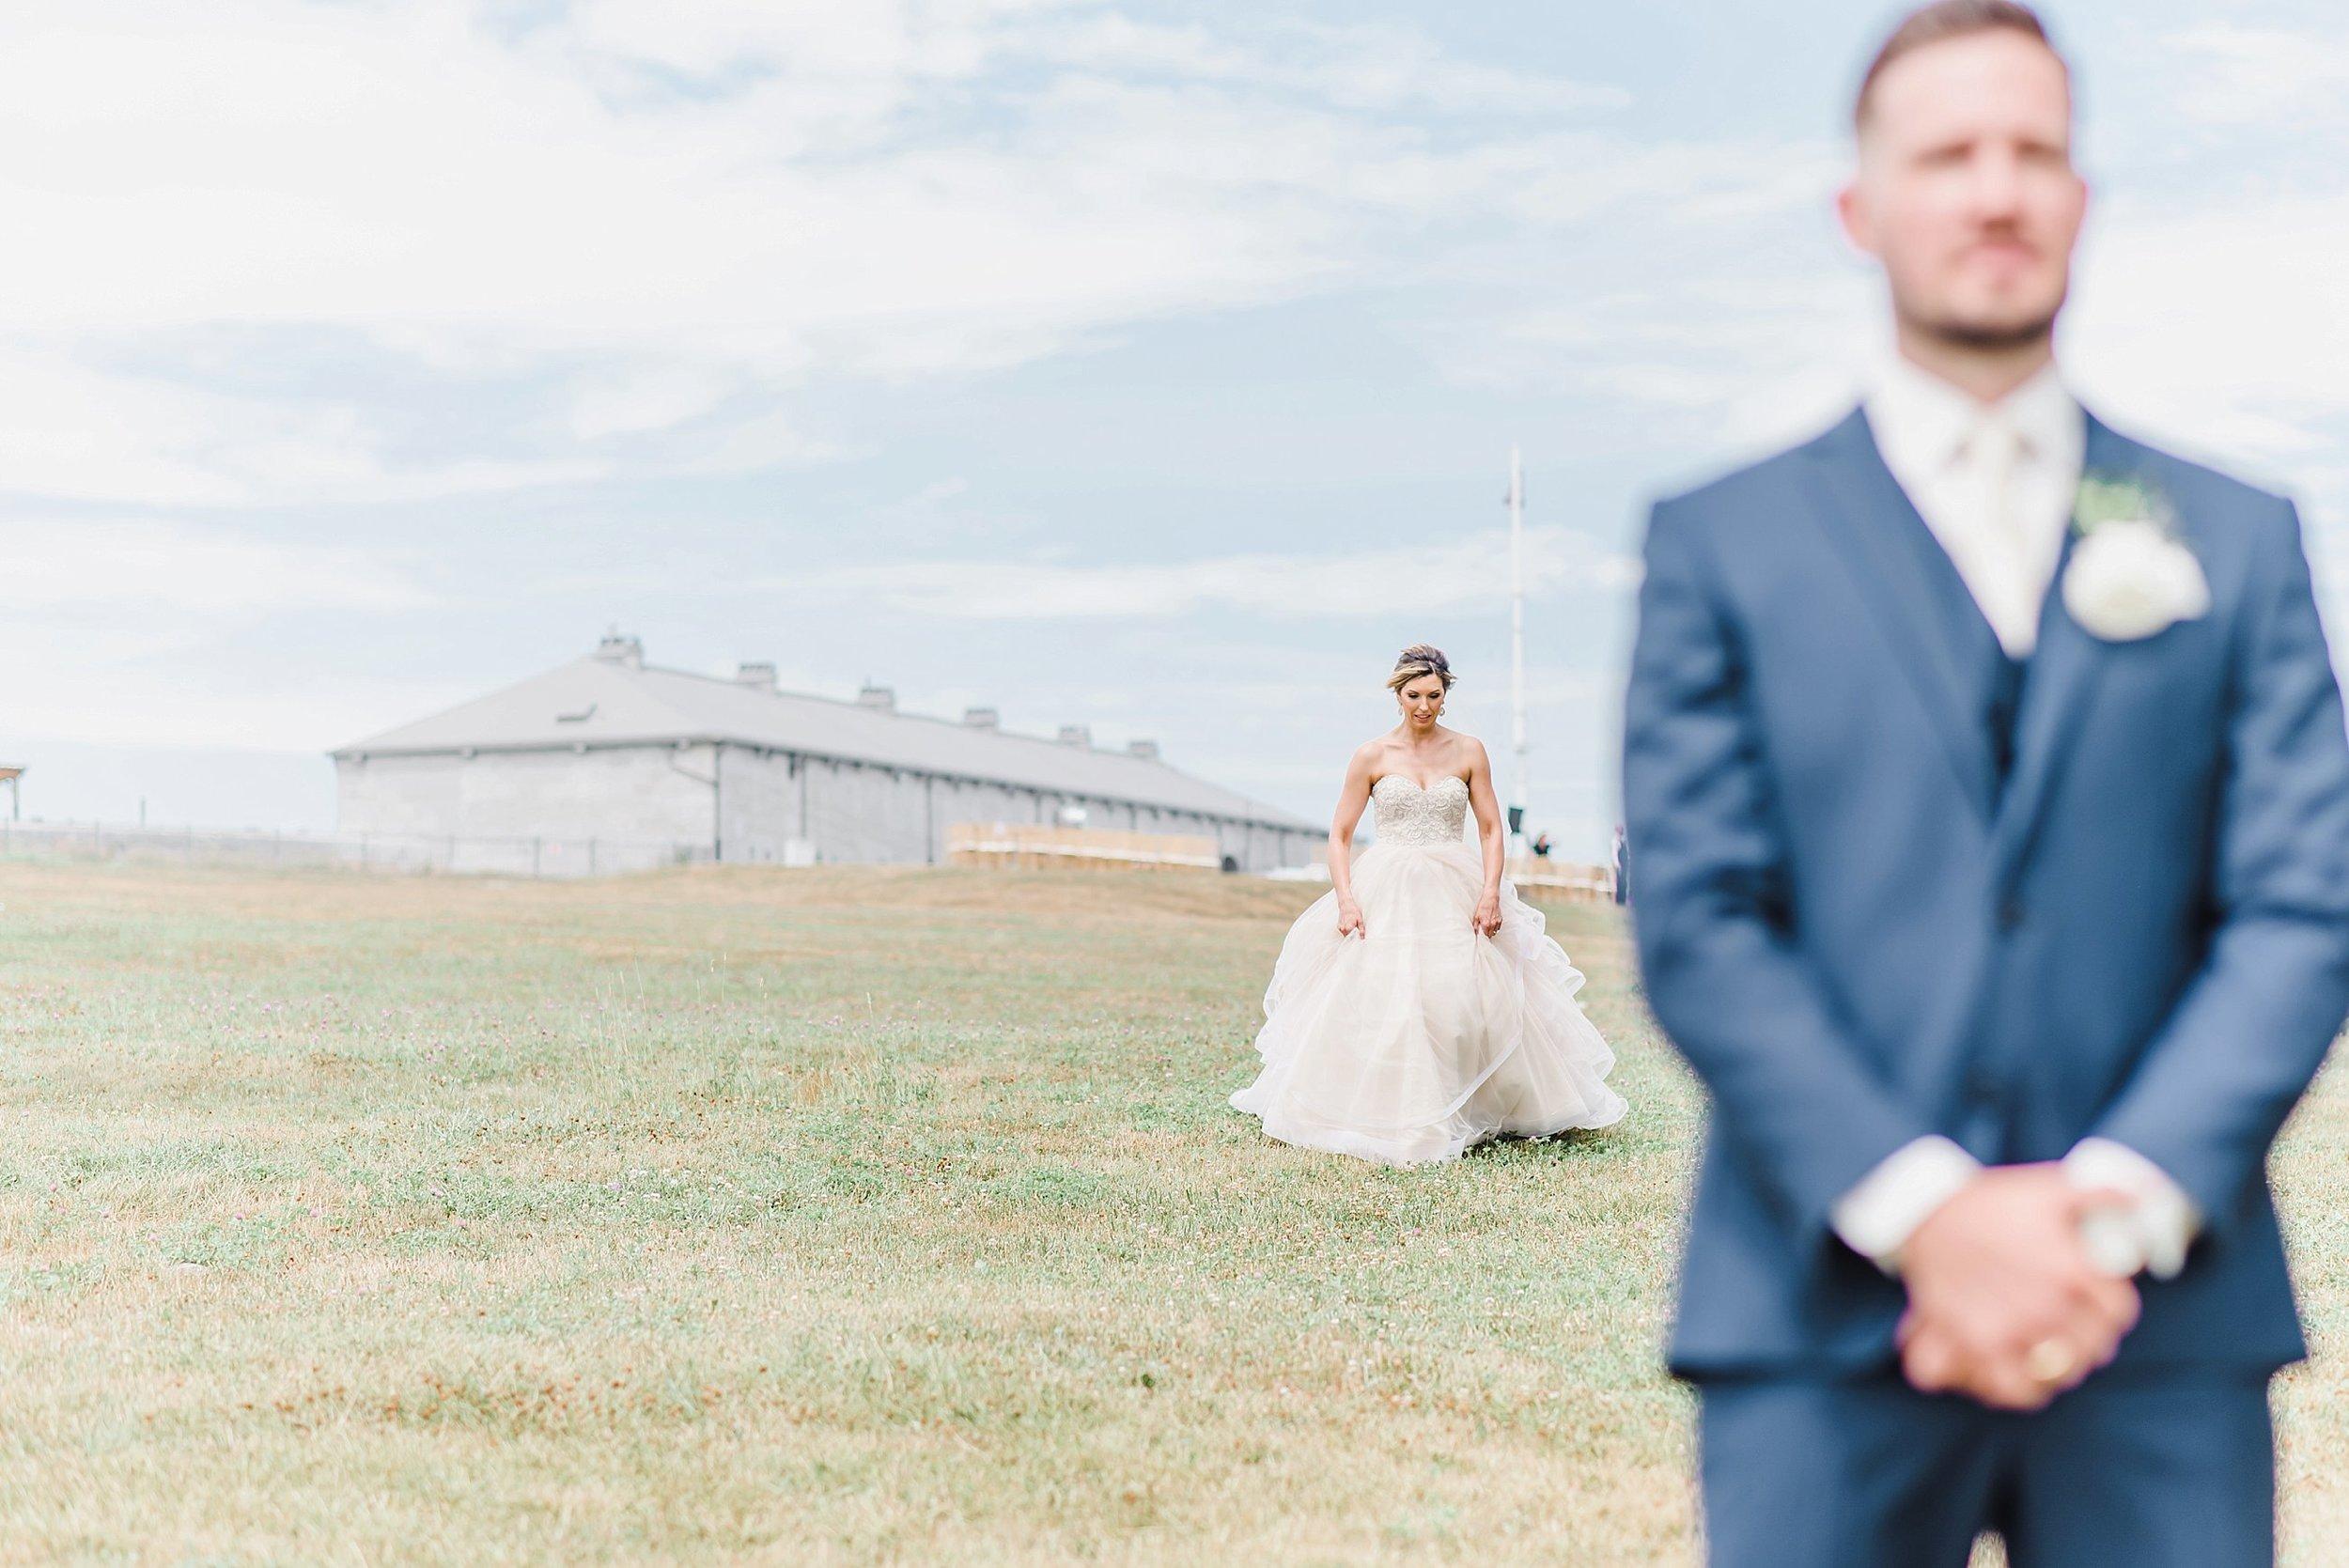 light airy indie fine art ottawa wedding photographer | Ali and Batoul Photography_0151.jpg